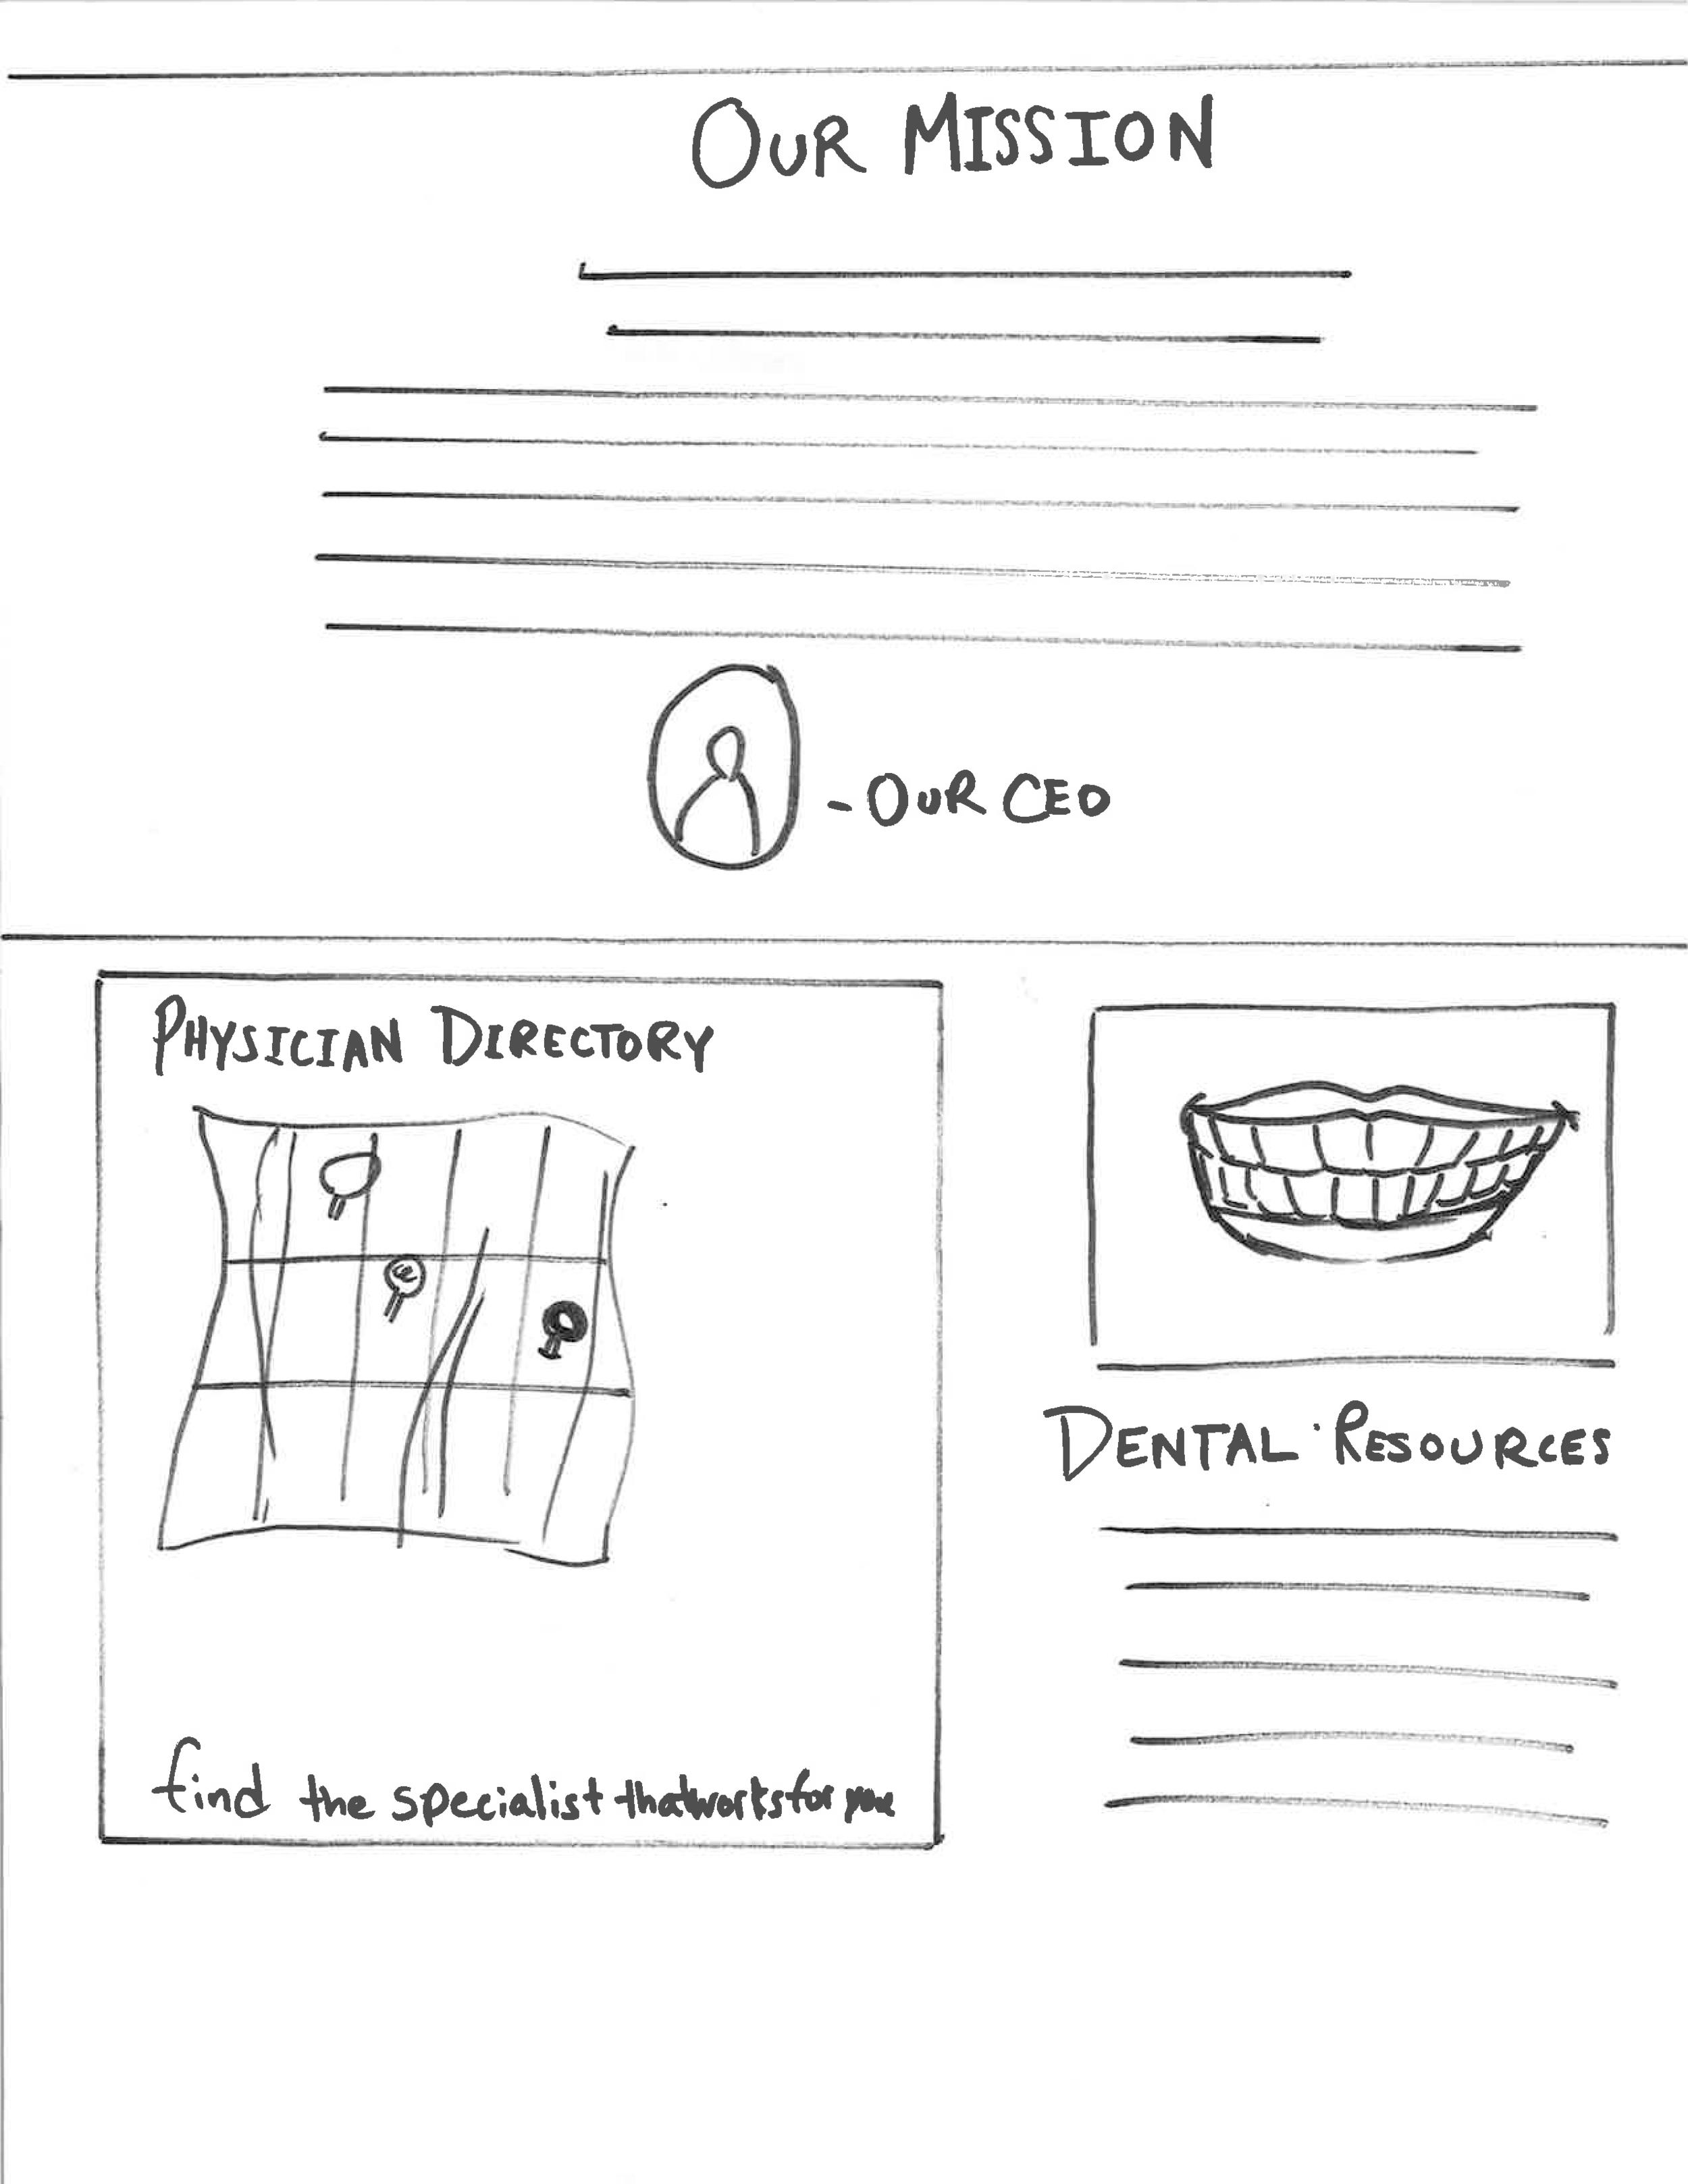 responsive-design-06.png